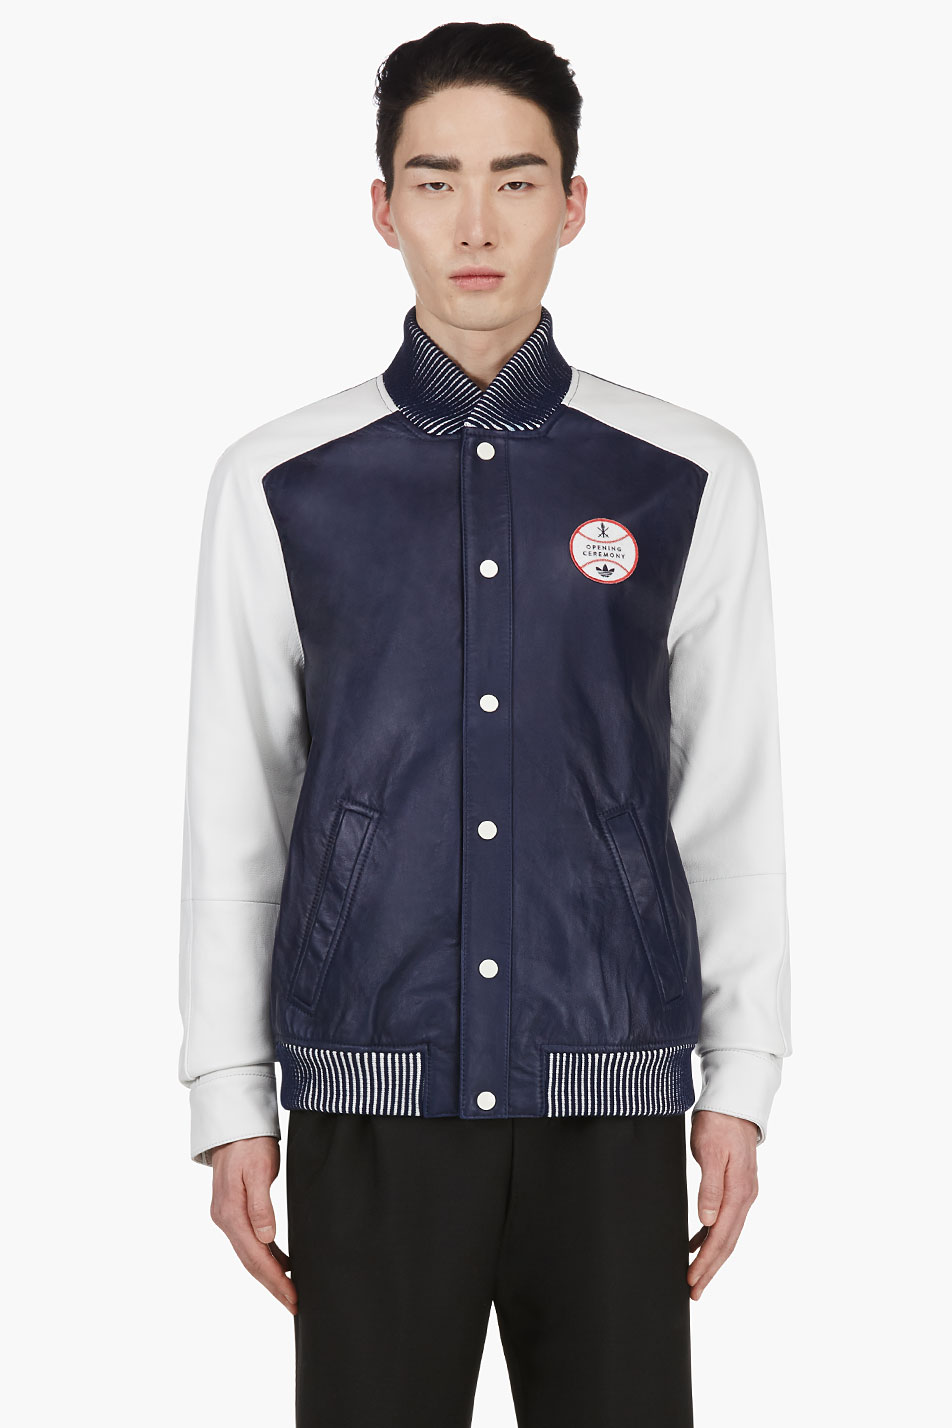 adidas originals x opening ceremony navy leather colorblock varsity jacket